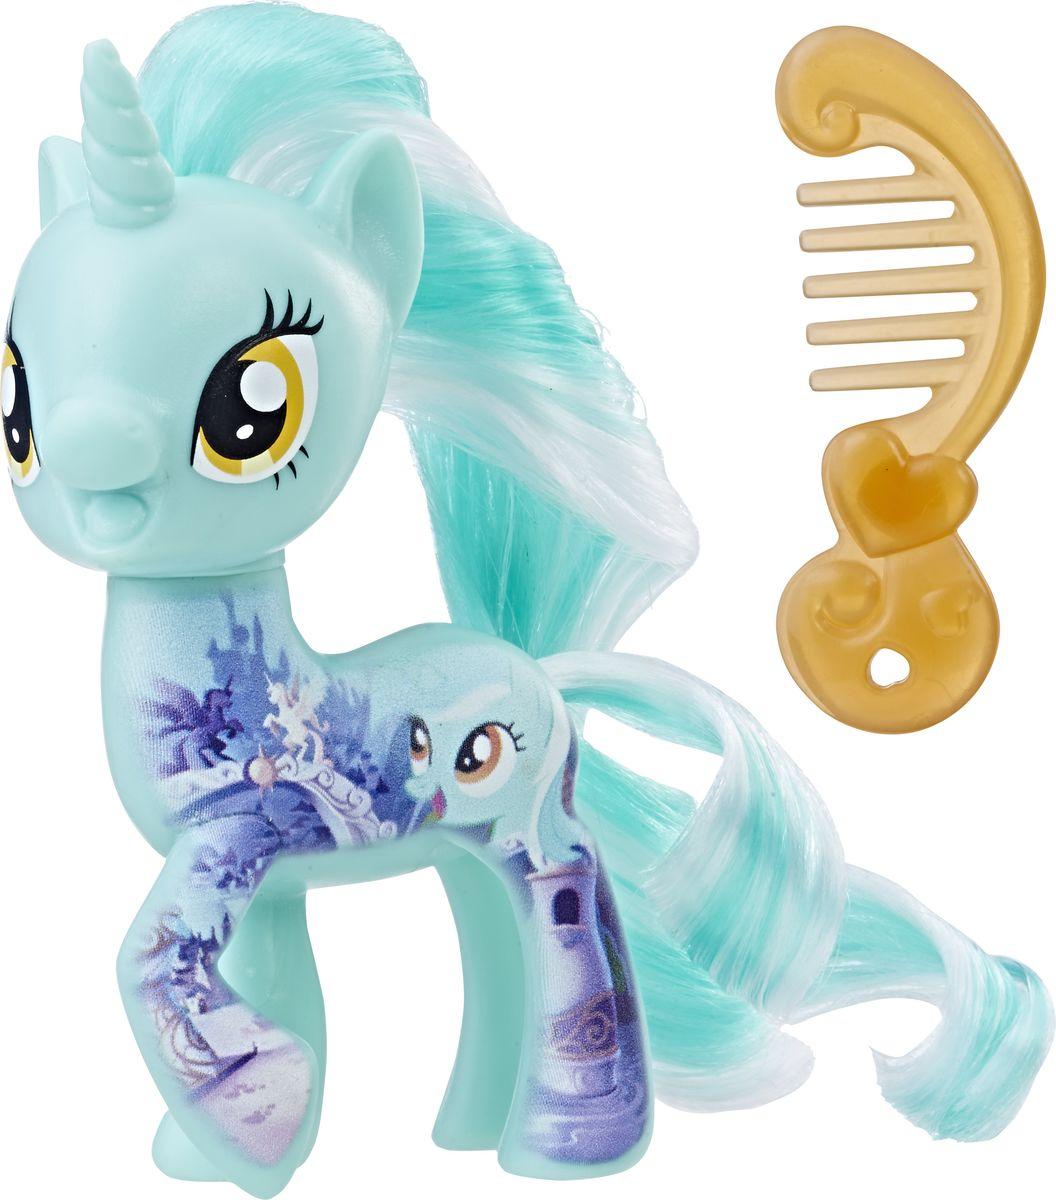 My Little Pony Фигурка All About Lyra Heartstrings мульти пульти мягкая игрушка принцесса луна 18 см со звуком my little pony мульти пульти